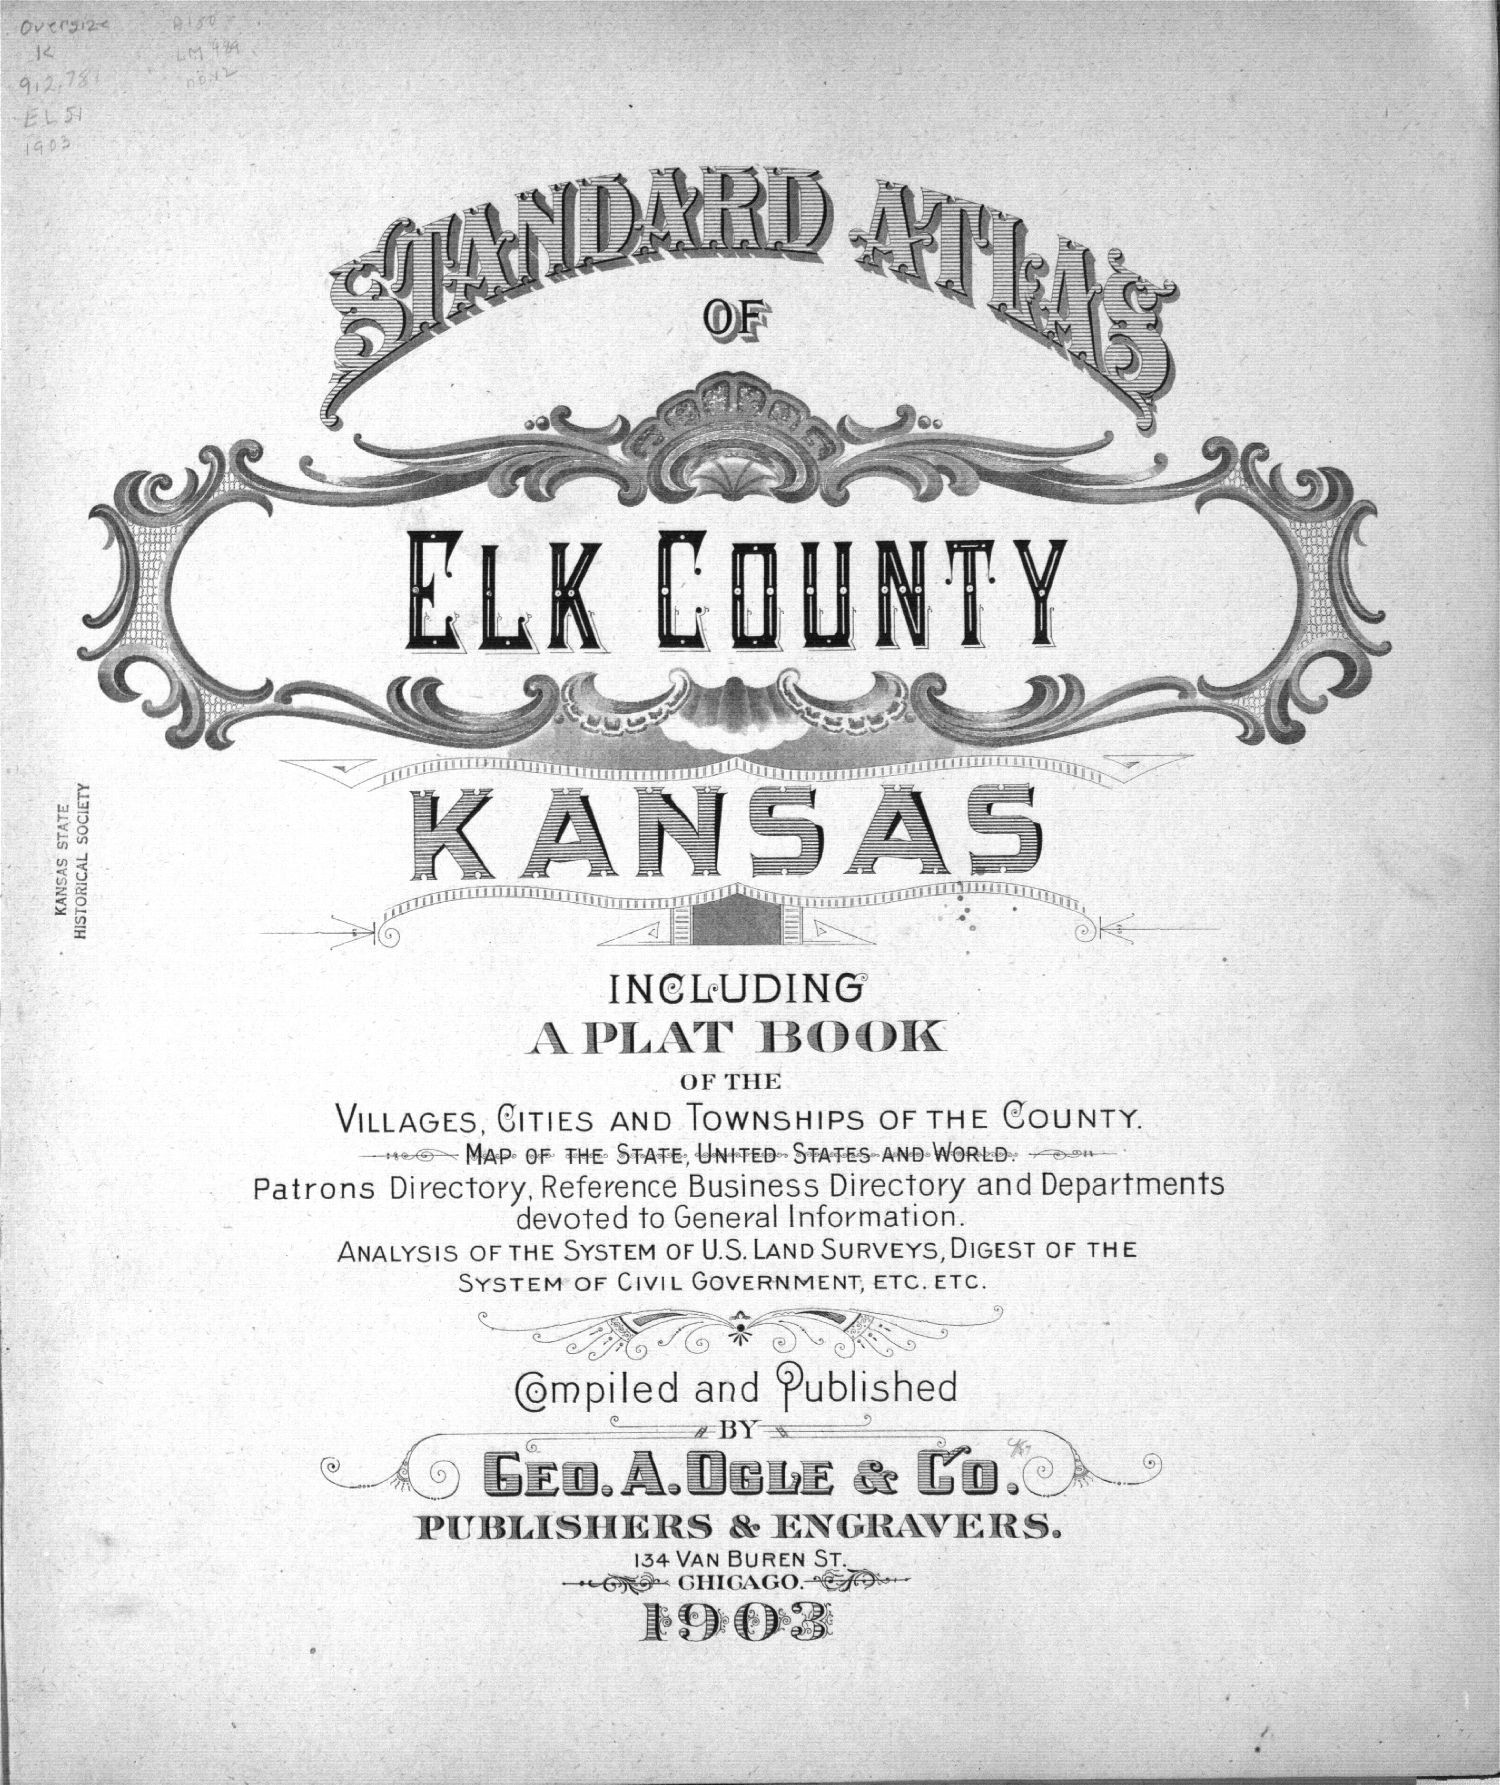 Standard atlas of Elk County, Kansas - Title Page